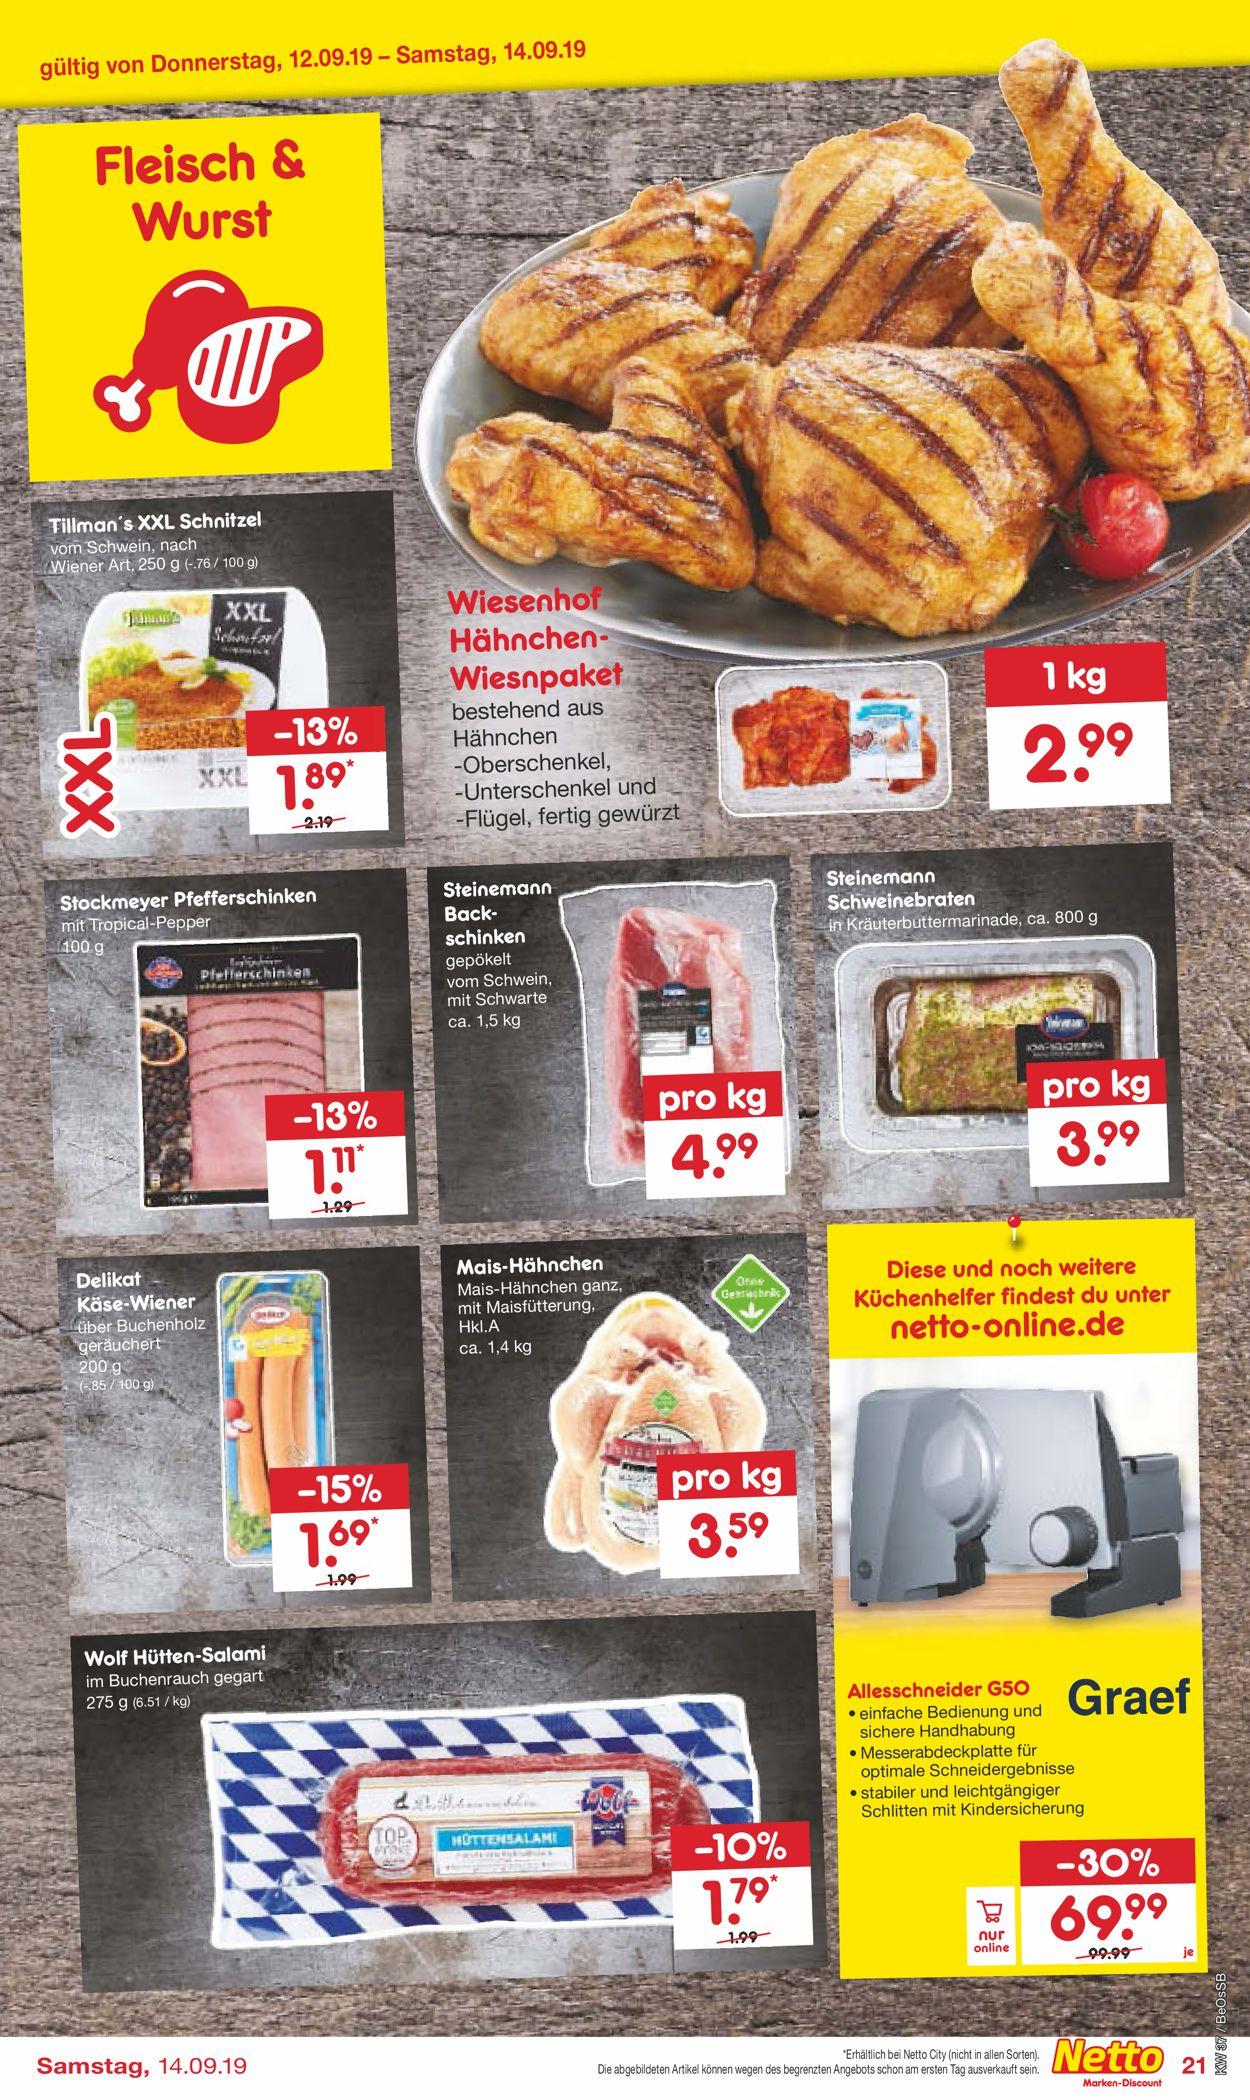 Netto Marken Discount Aktueller Prospekt 20.20   20.20.20 [20 ...